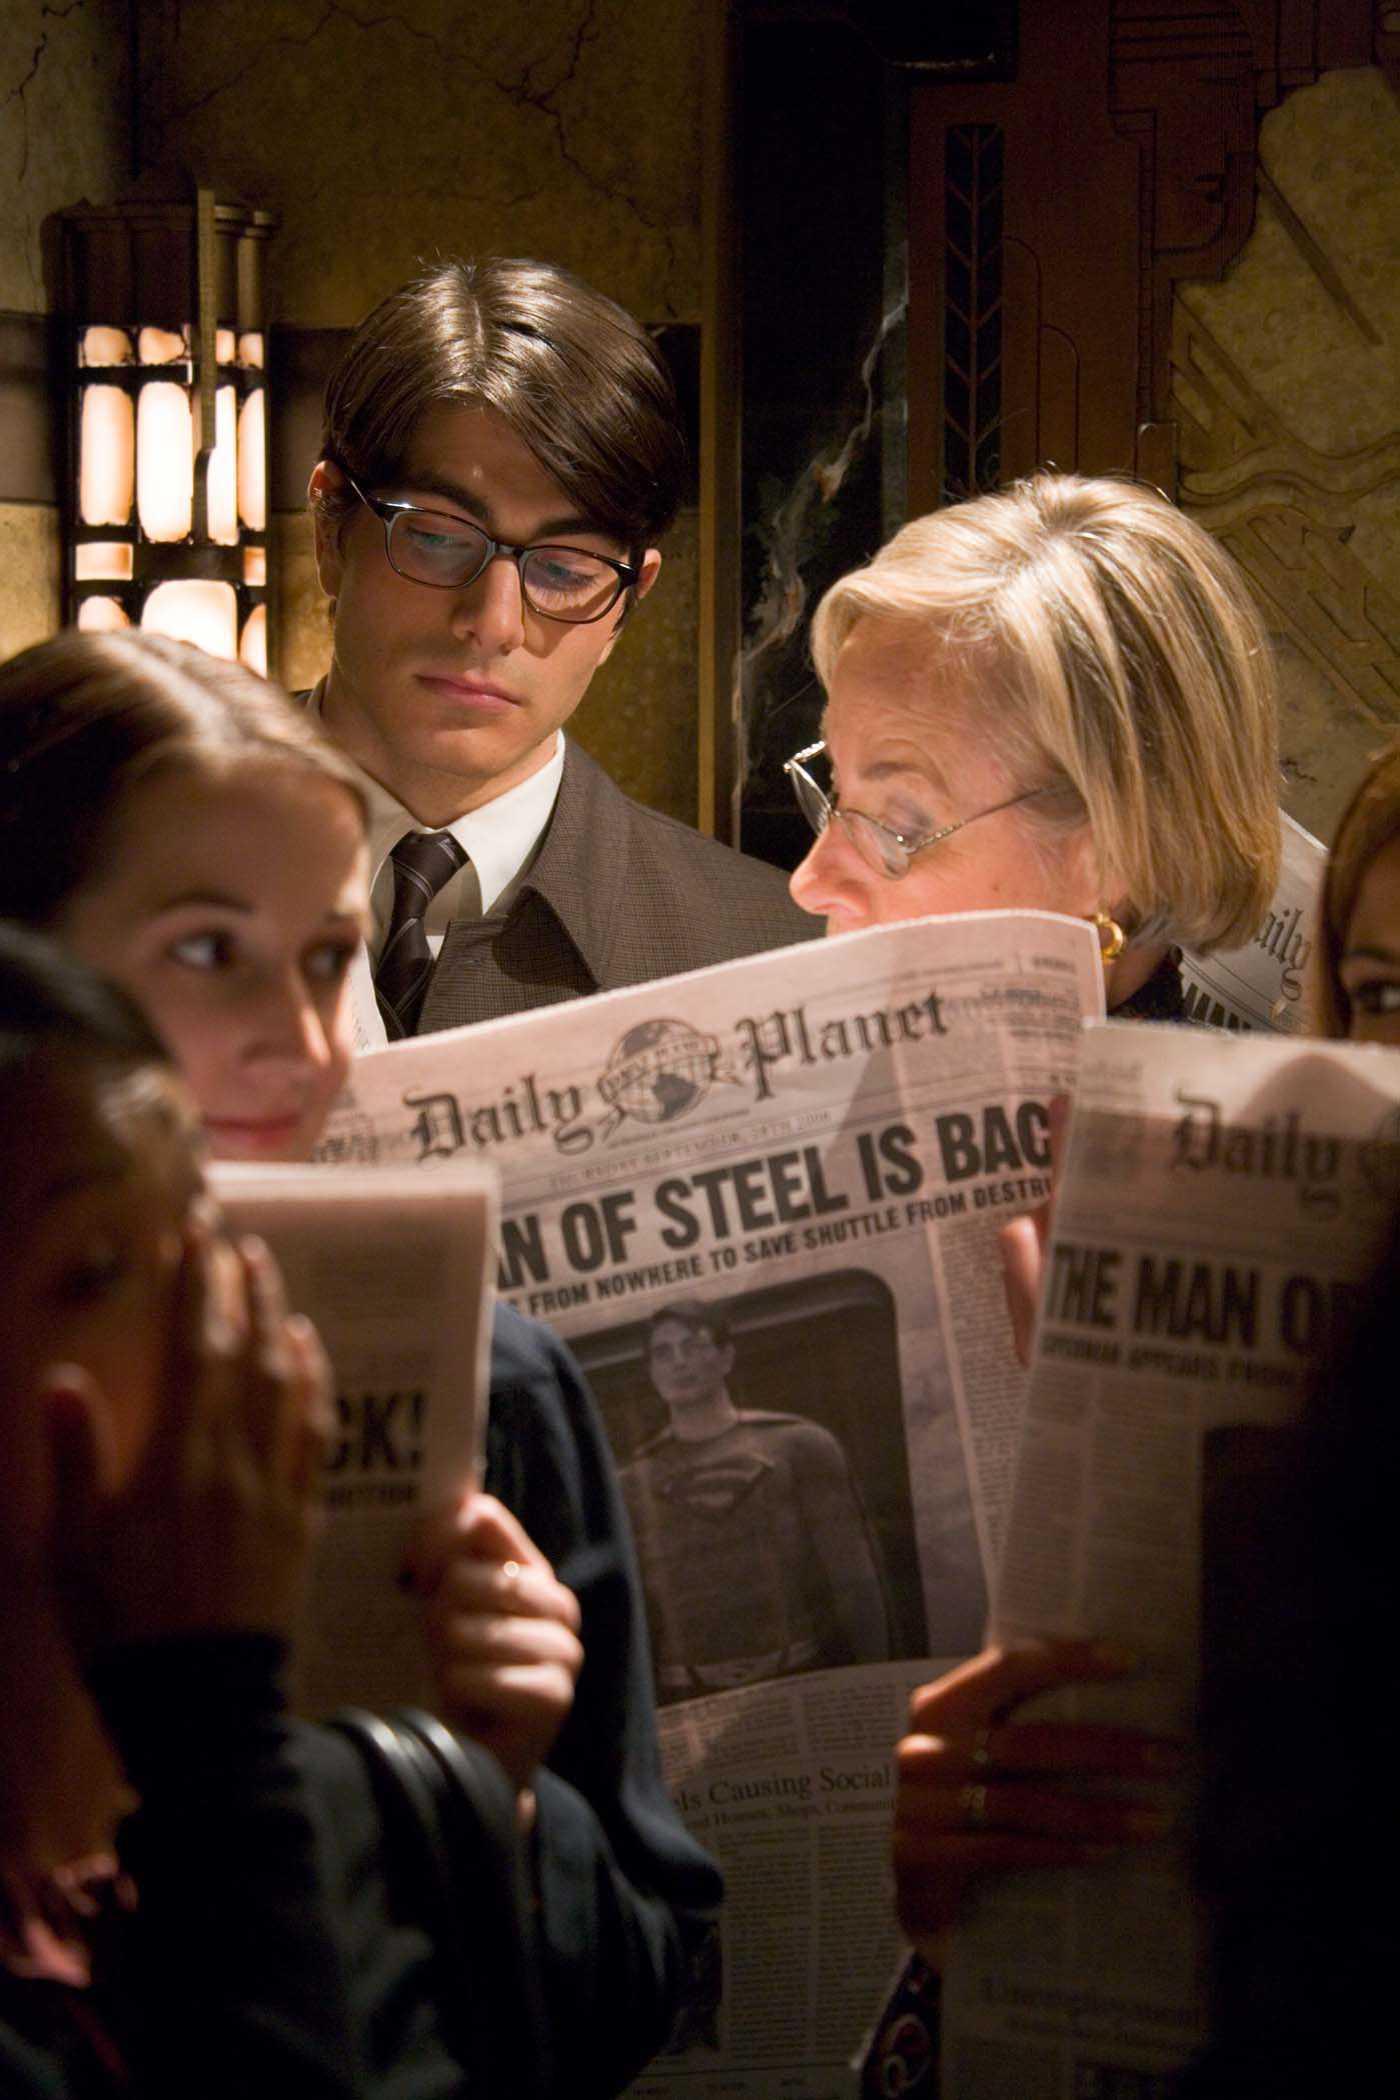 Superman Returns - Movies Photo (8692996) - Fanpop